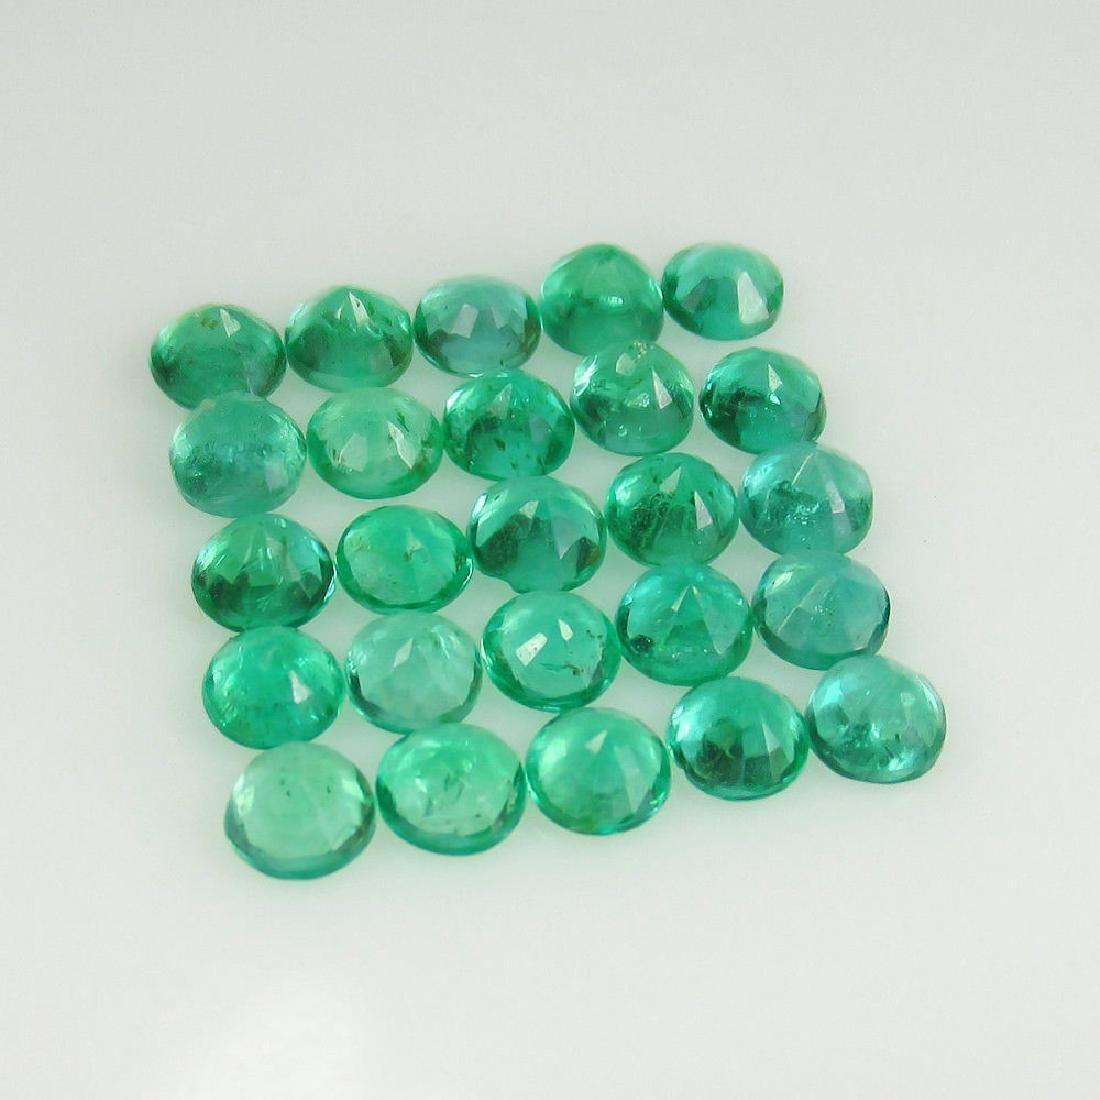 4.04 Ctw Natural 25 Loose Calibrate Emerald 3.5 mm - 3